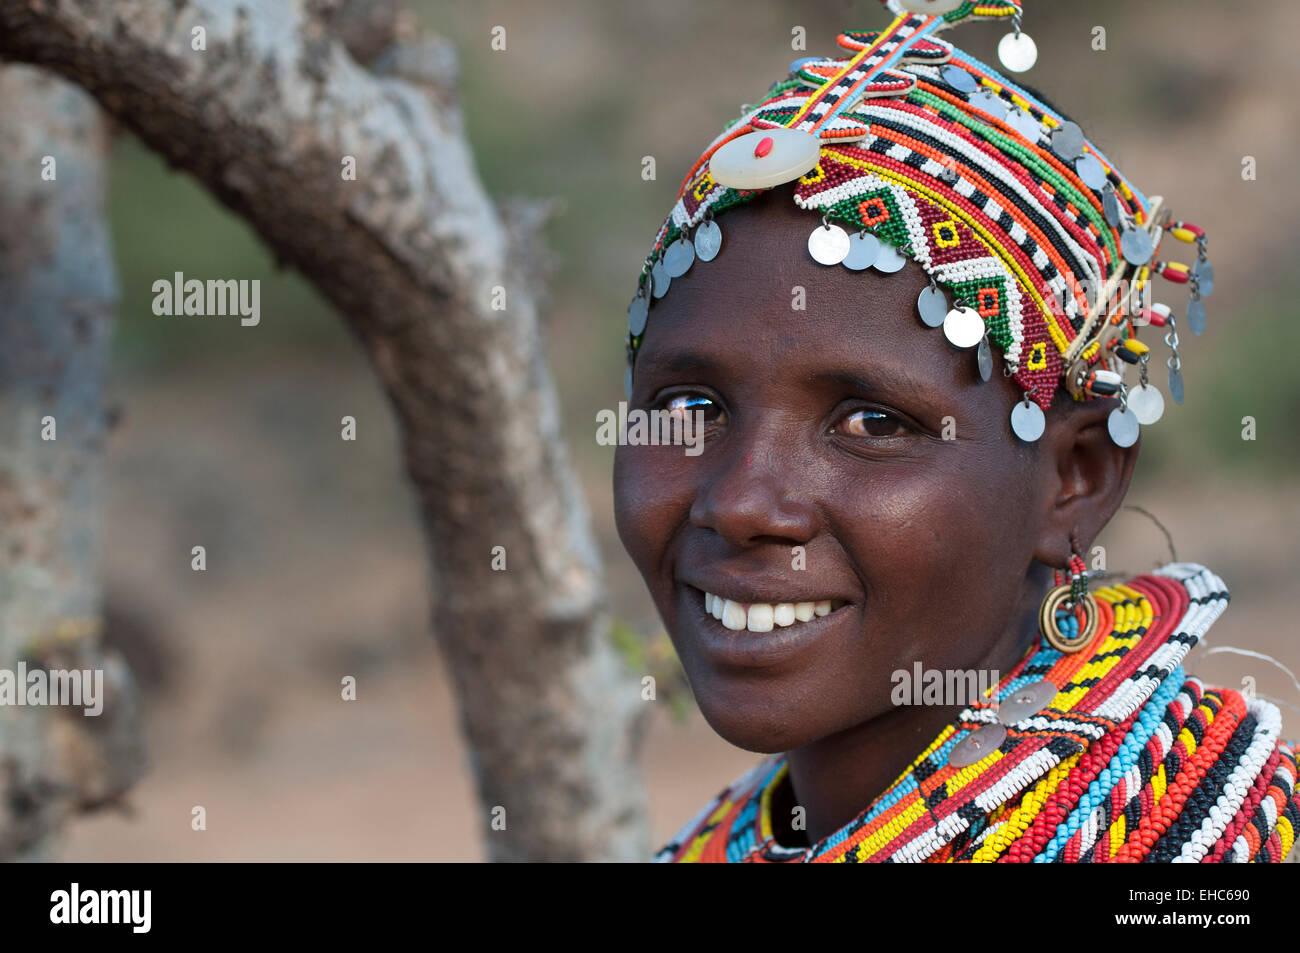 Smiling young Samburu woman with massive colorful necklaces and headdress, Ngurunit area, Kenya - Stock Image